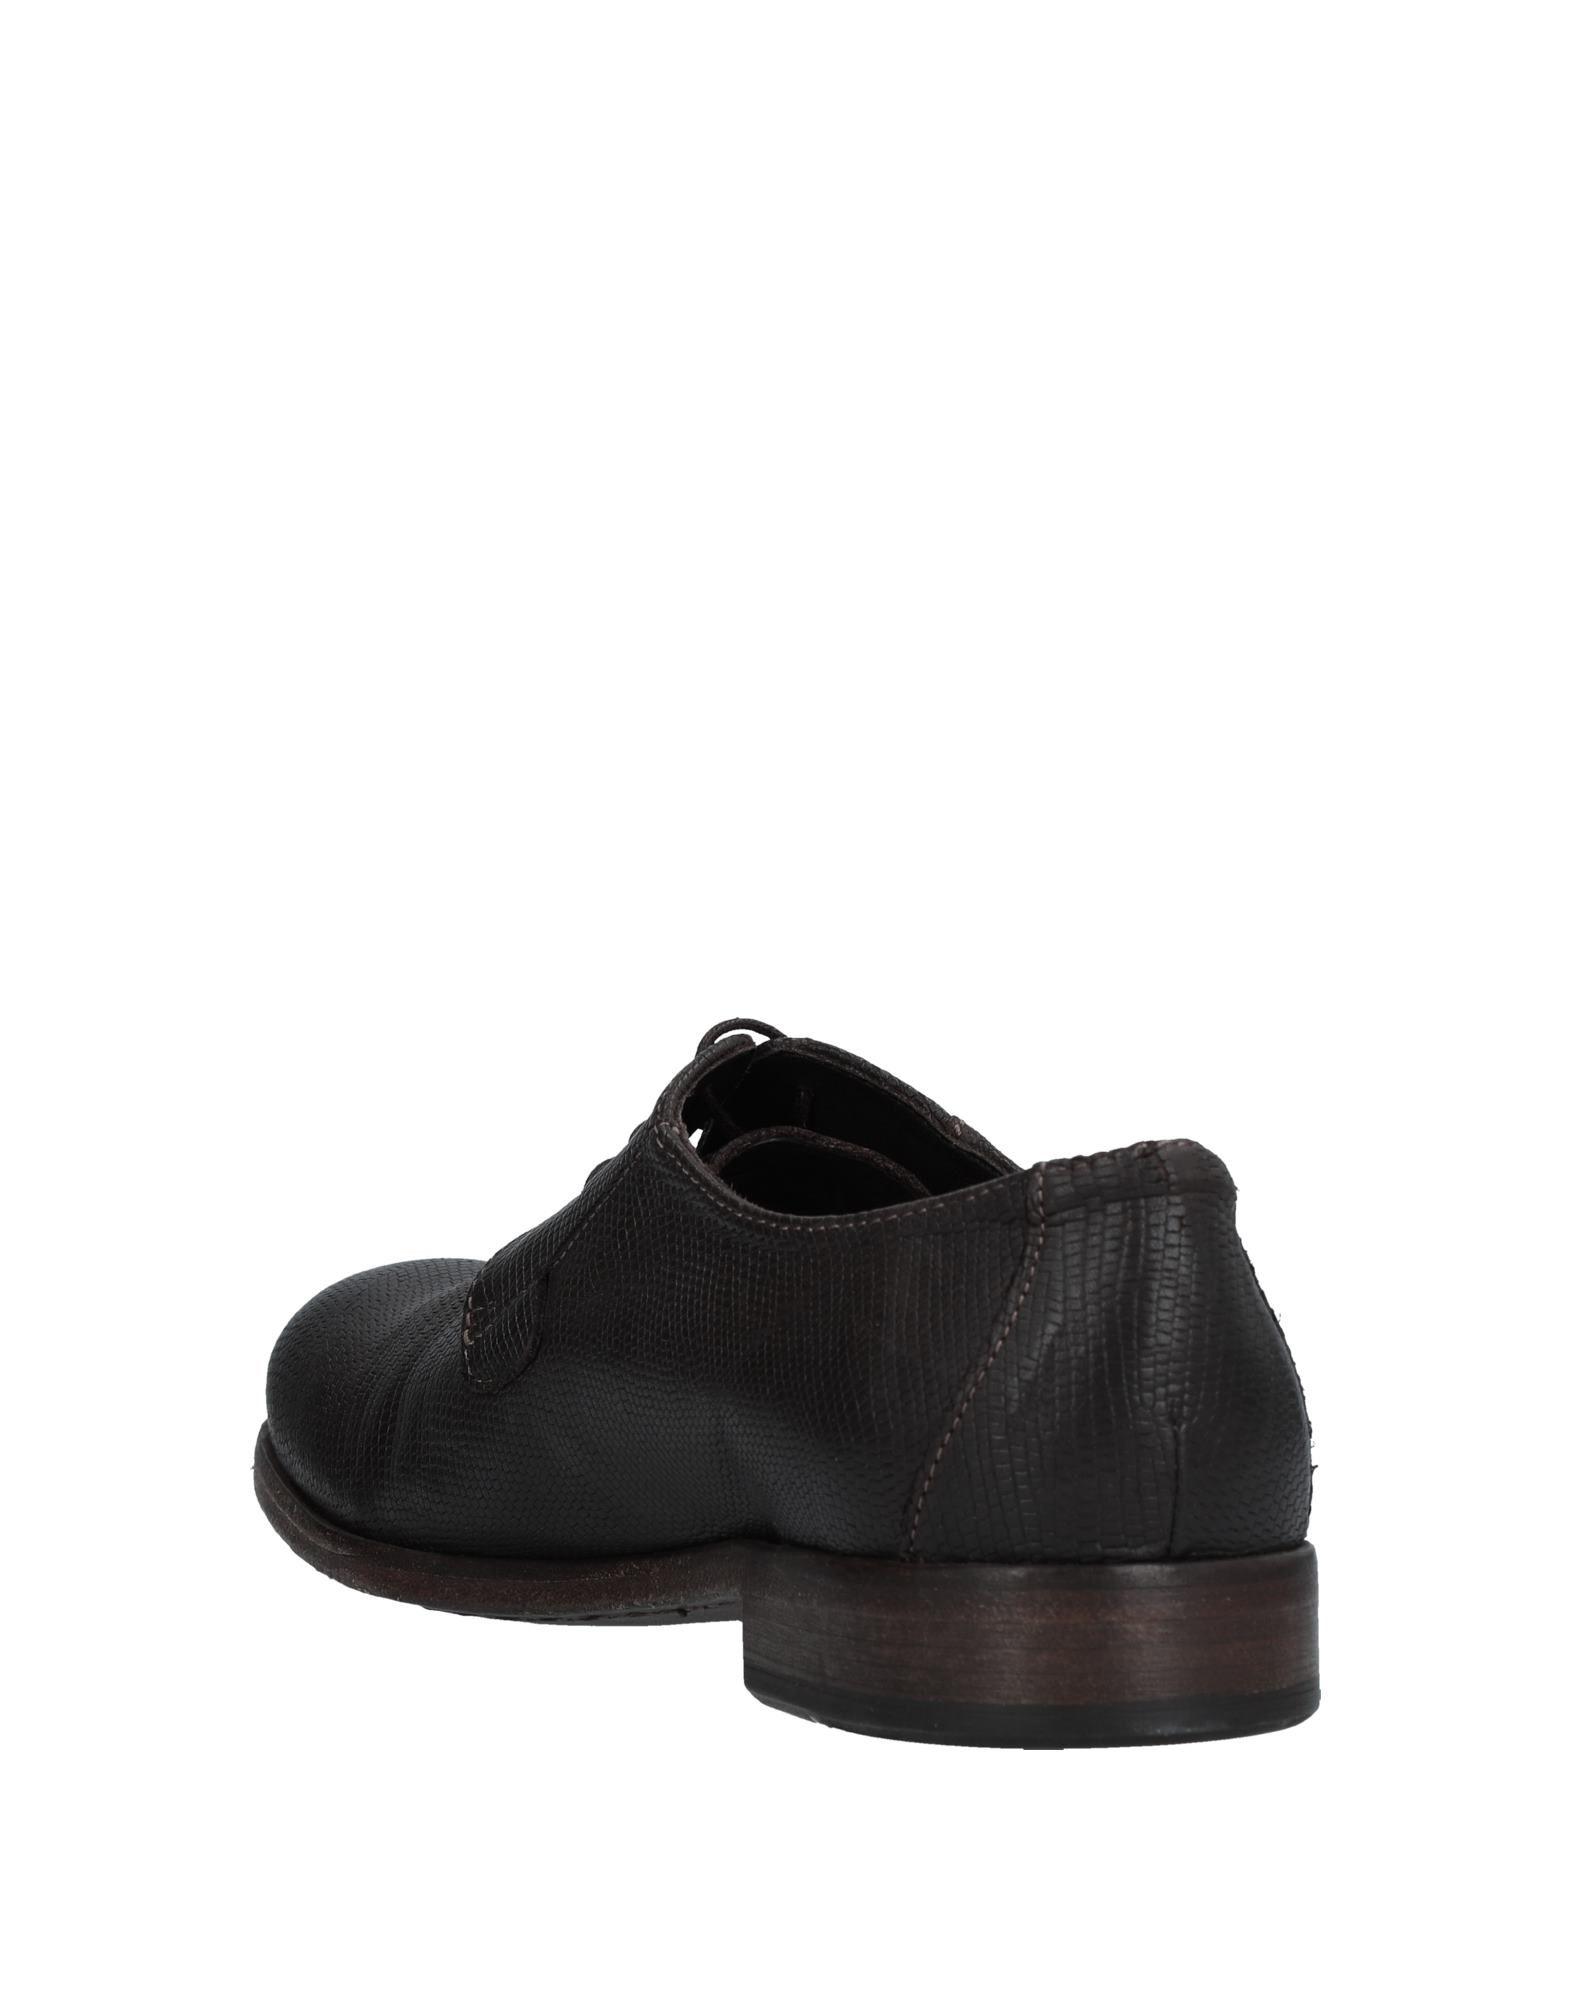 Rabatt echte Schuhe Young Schnürschuhe Herren  11527910CM